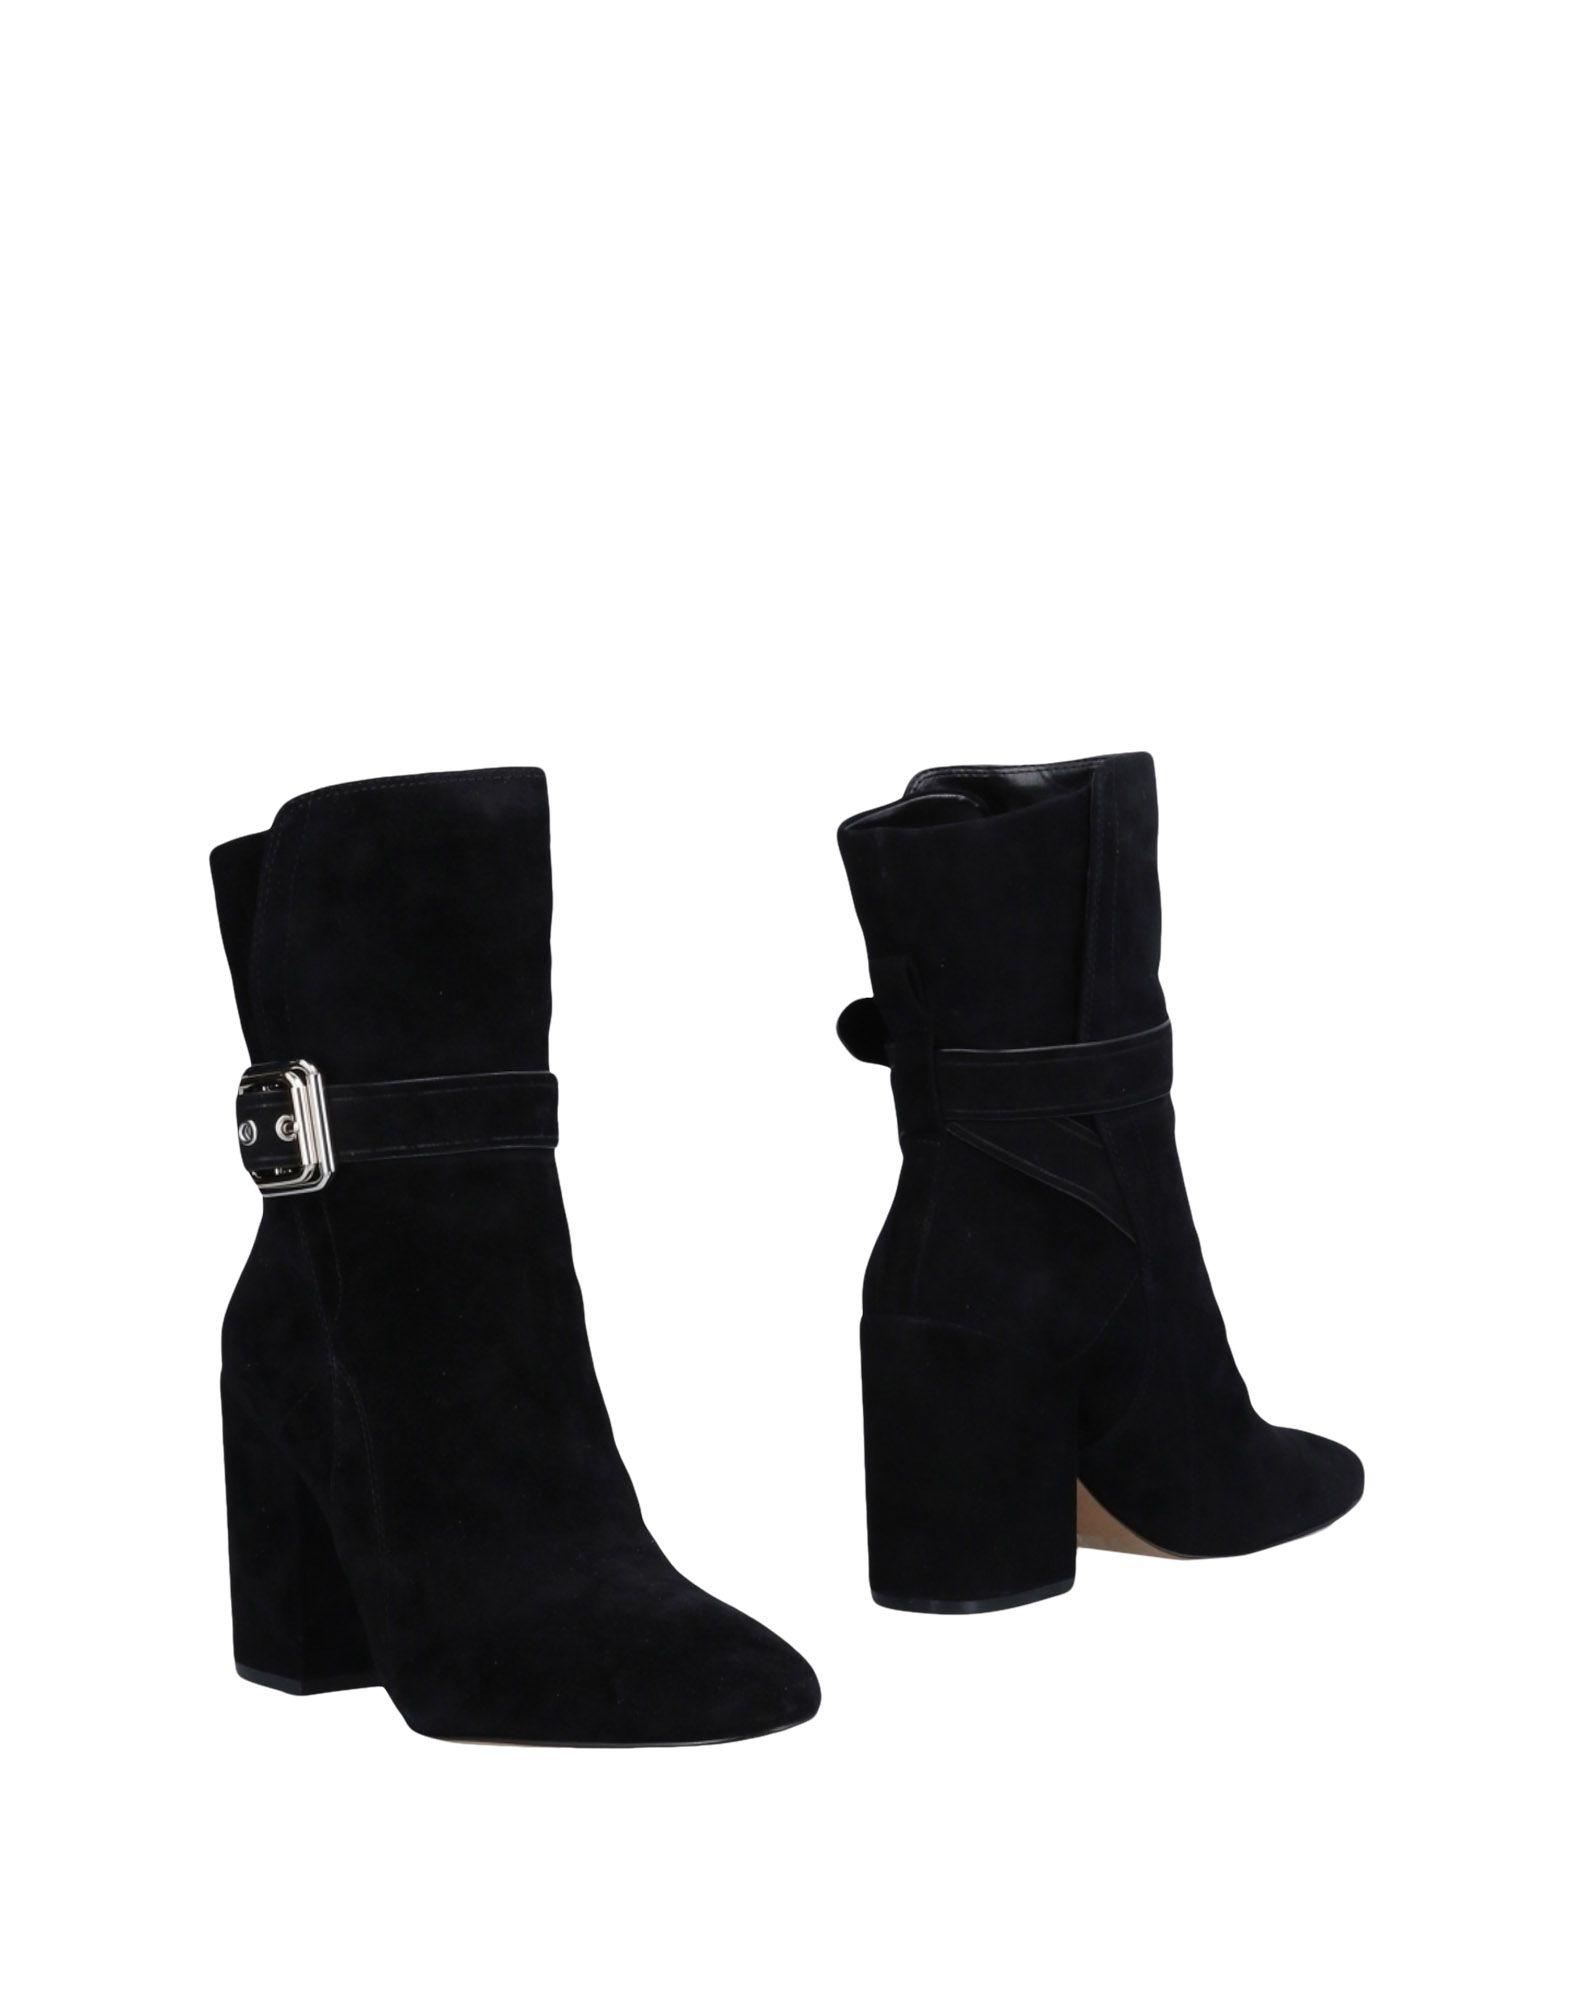 Vince Camuto Stiefelette Damen   Damen 11479343OA Gute Qualität beliebte Schuhe 443e17